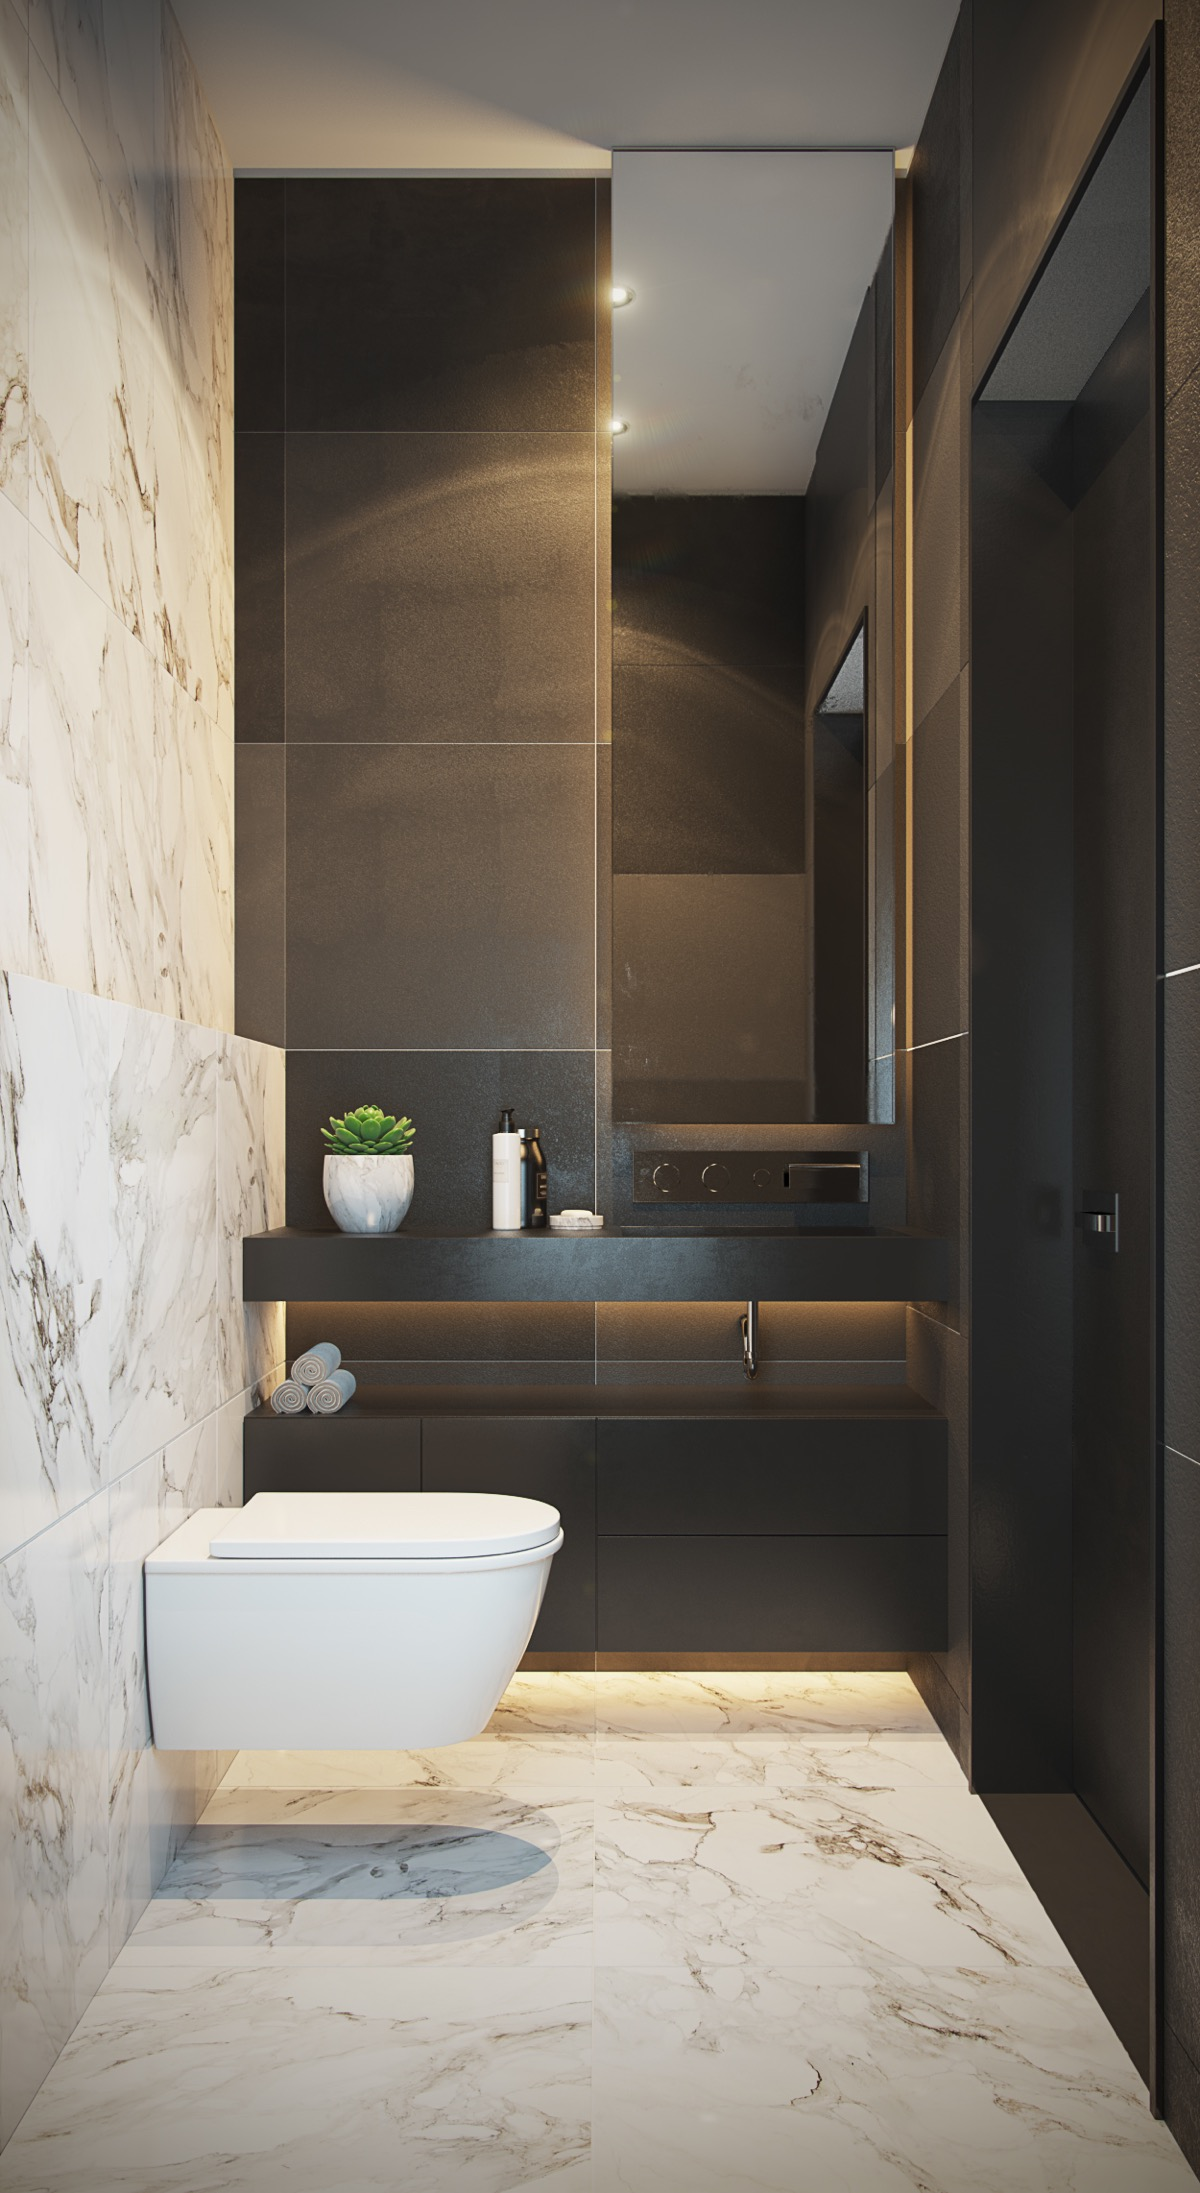 black-white-and-grey-bathroom-tiles